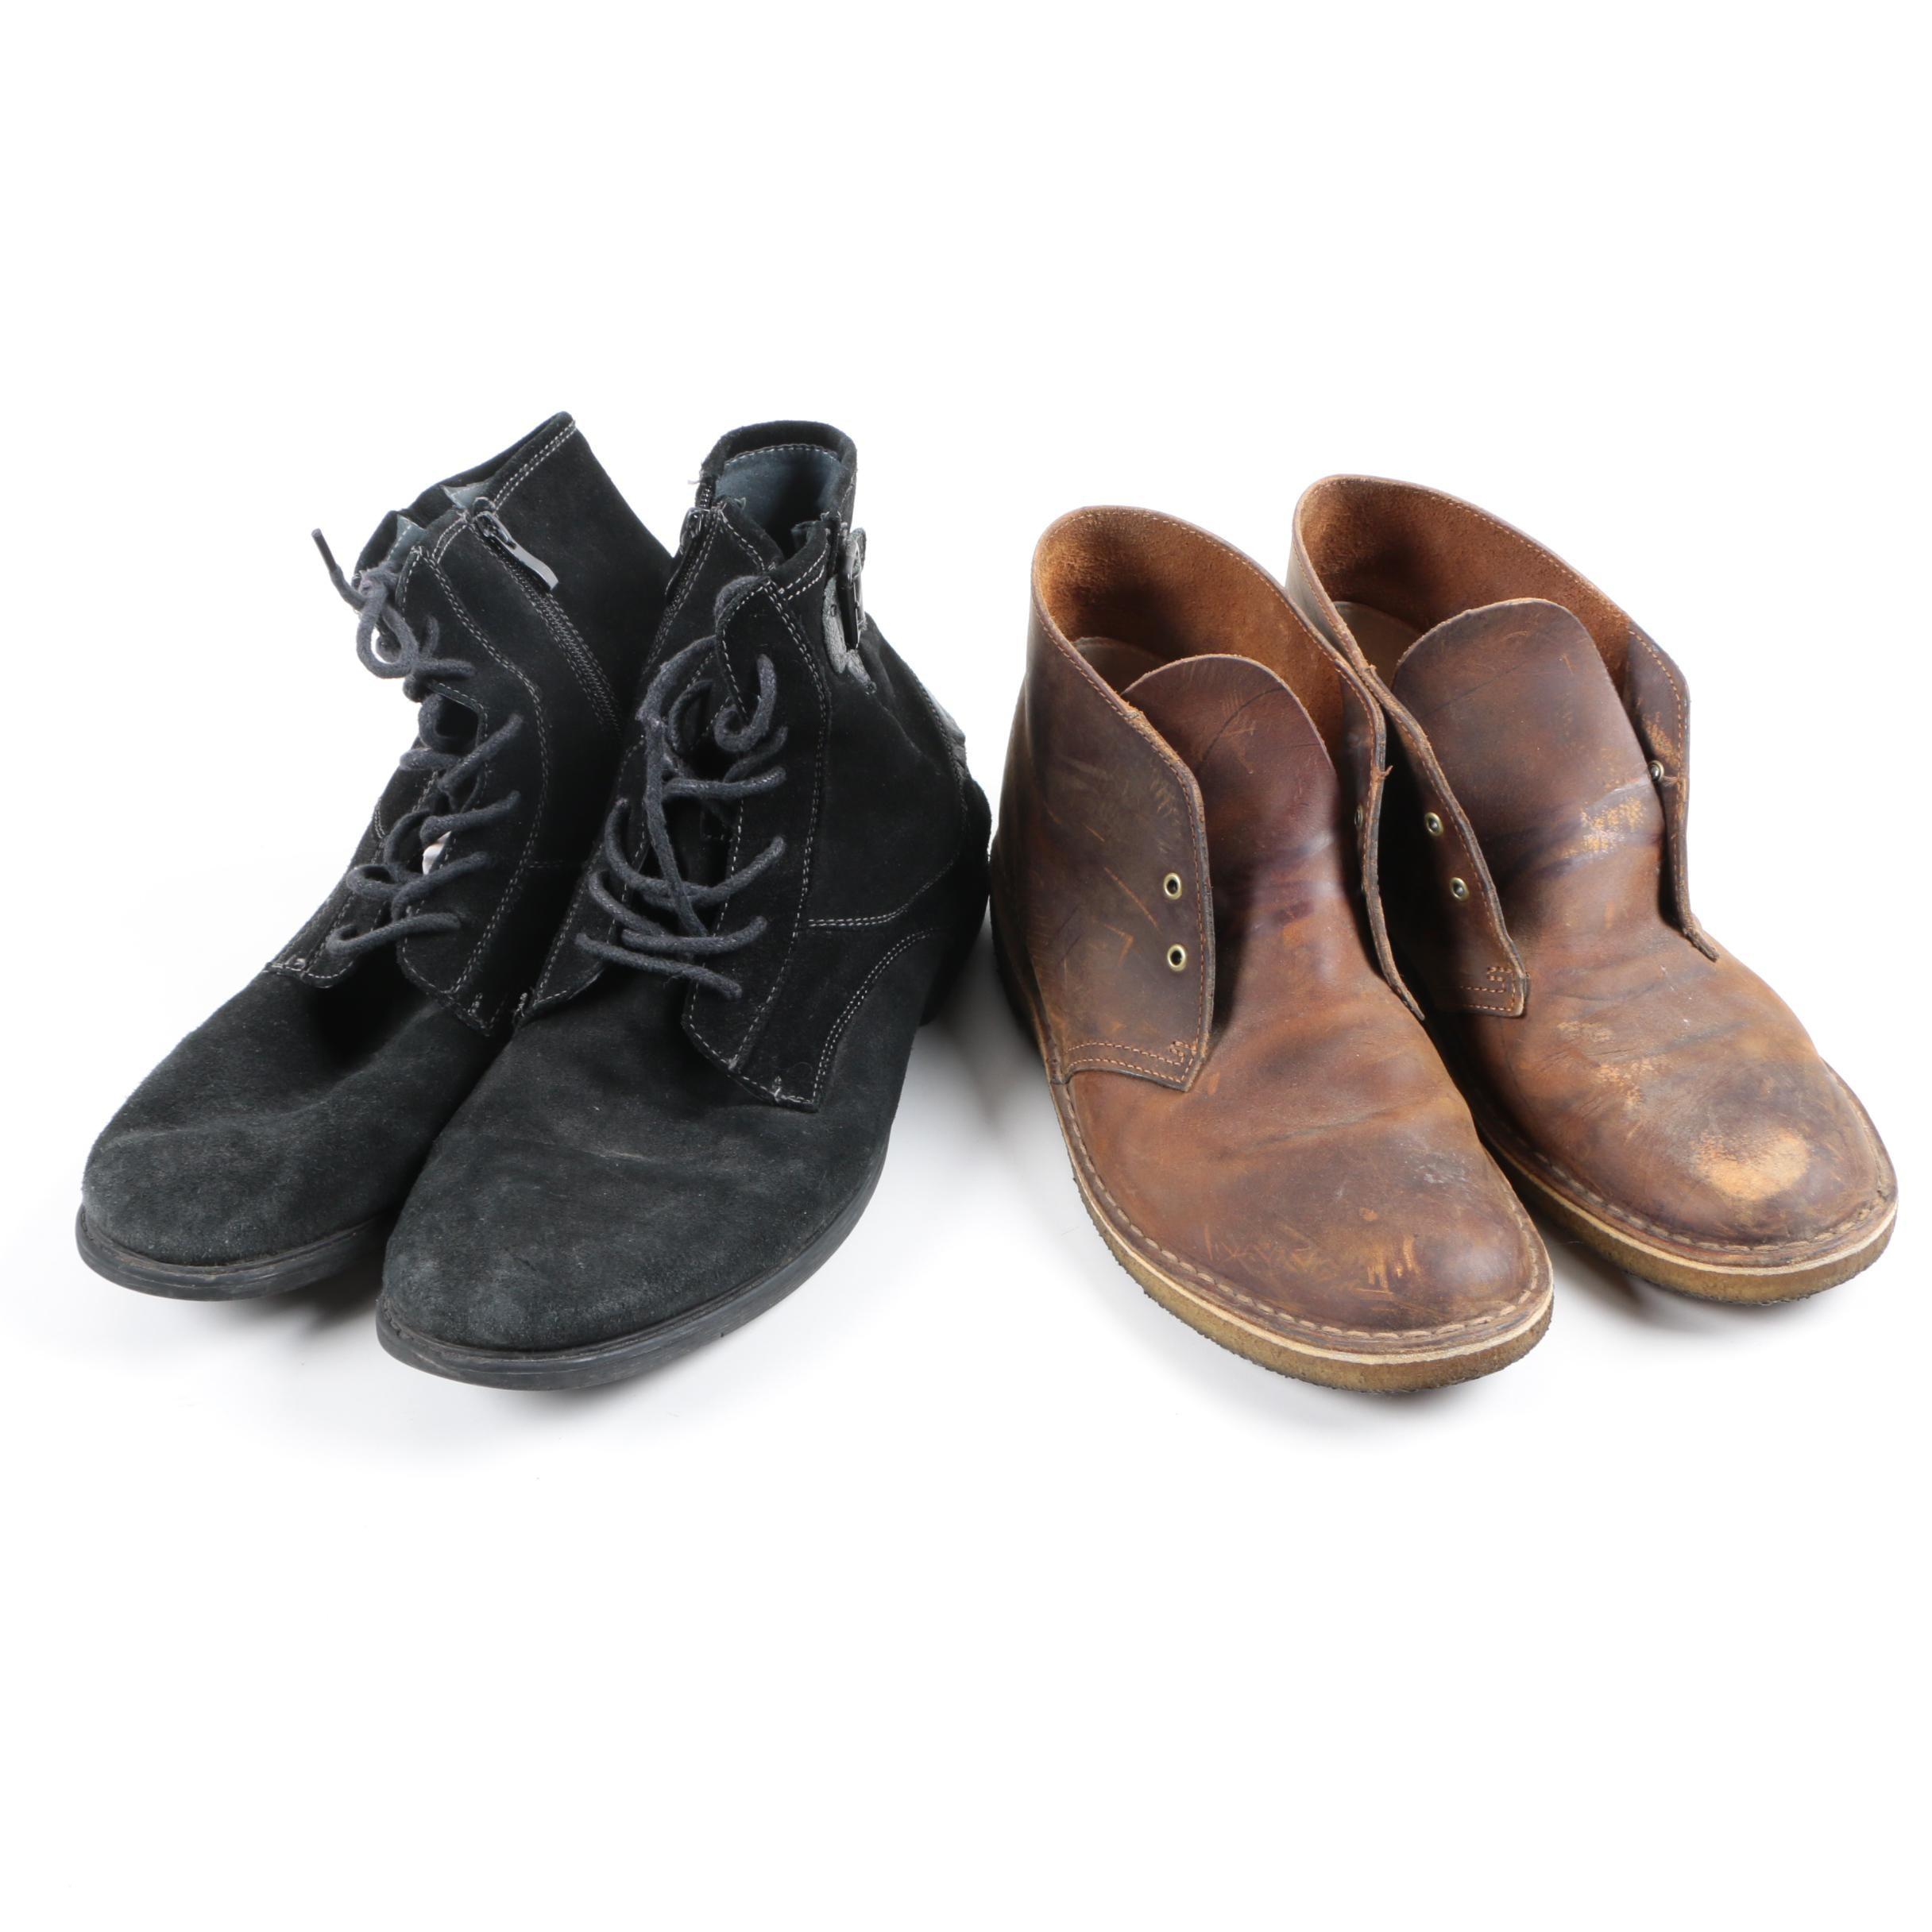 Men's Ankle Boots Including Steve Madden